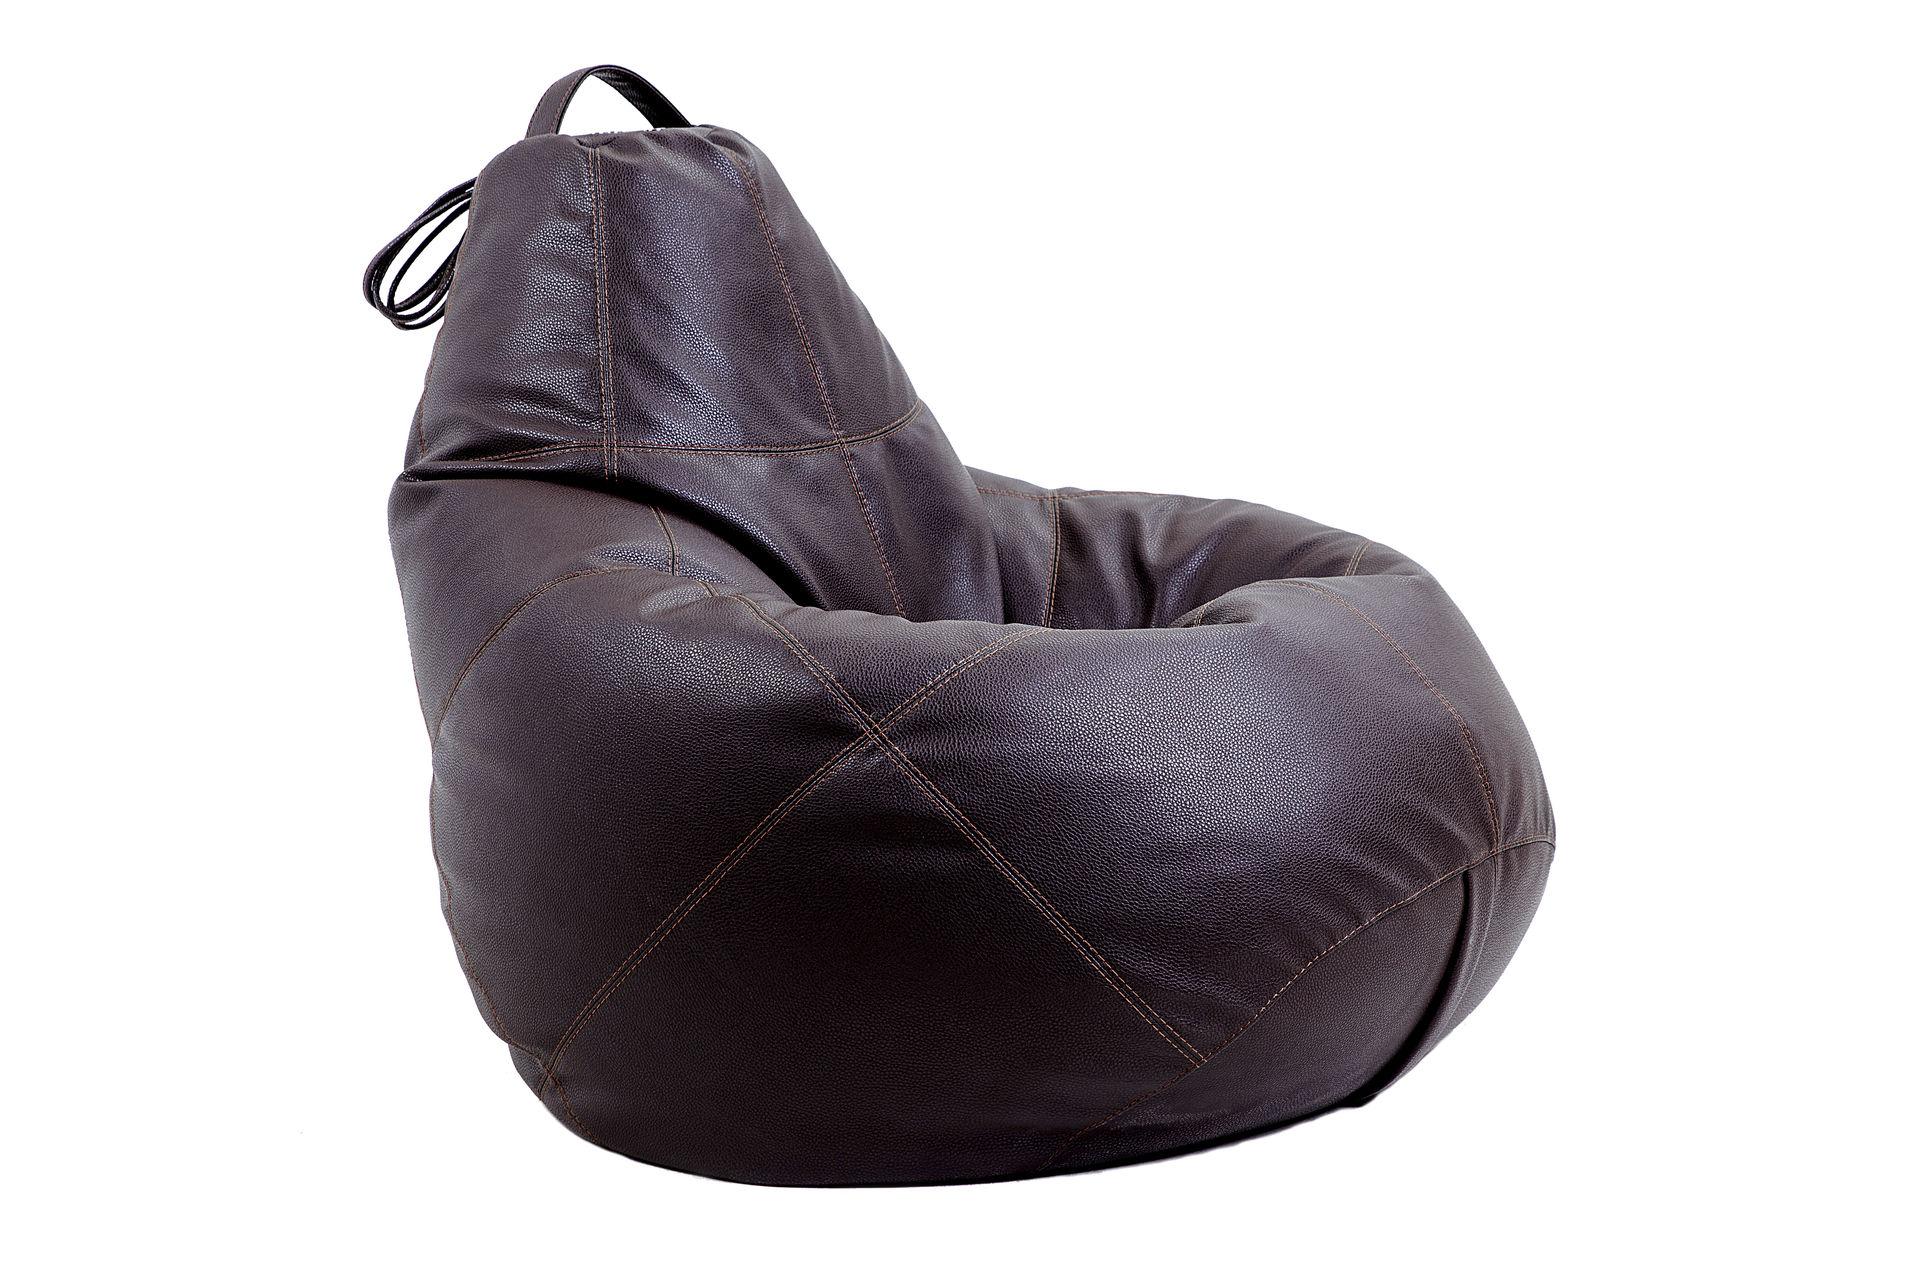 Бескаркасное креслоКресла-мешки<br><br><br>Material: Кожа<br>Height см: 150<br>Diameter см: 95